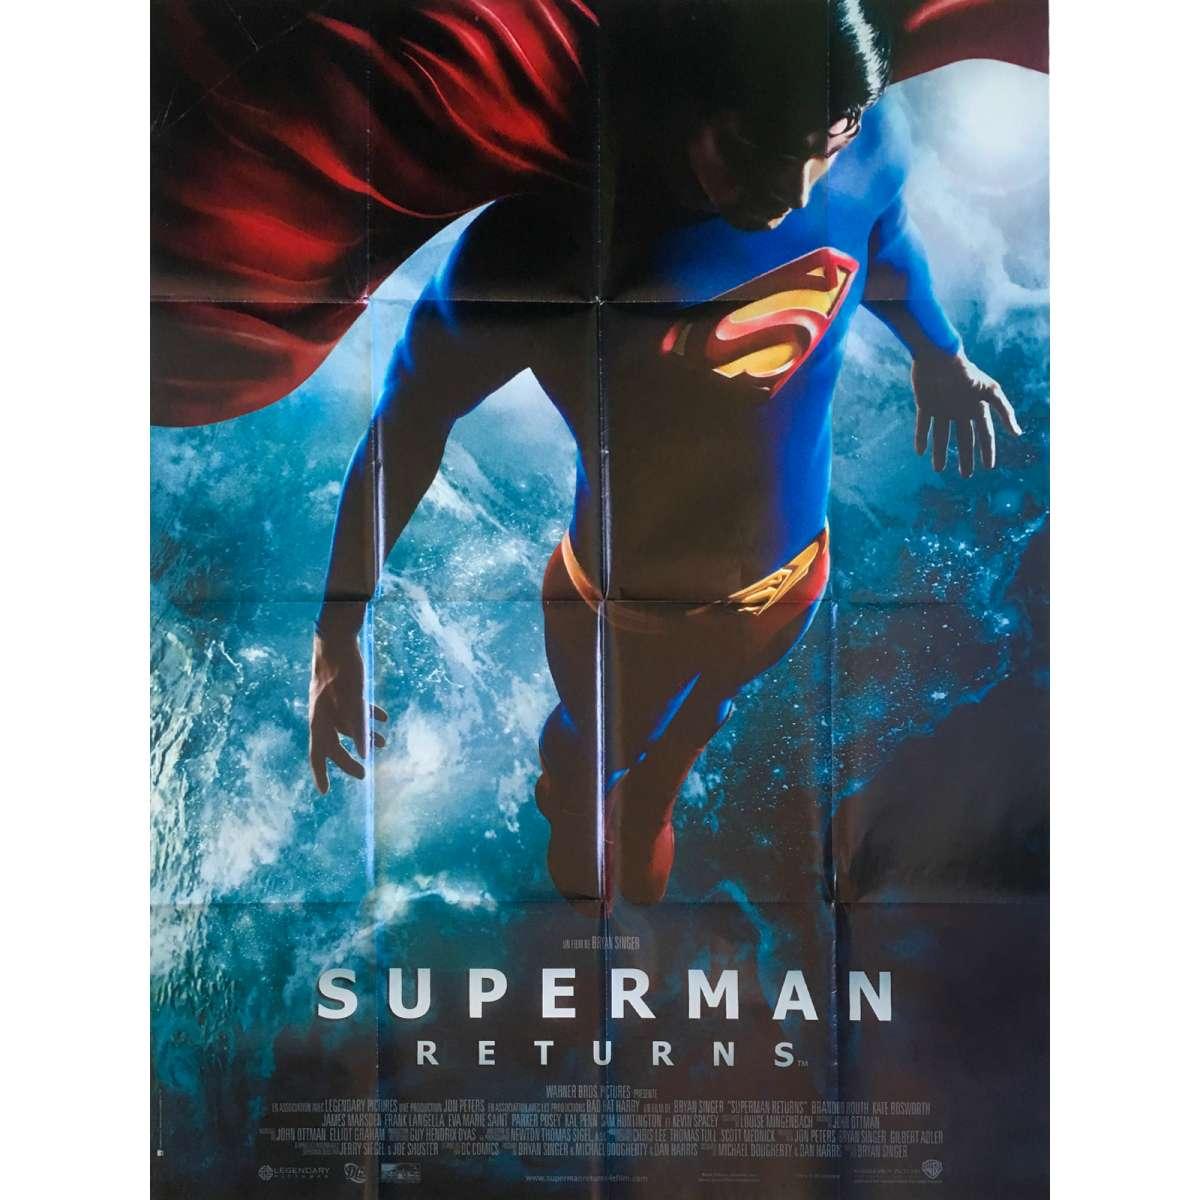 SUPERMAN RETURNS Original Movie Poster - 47x63 in  - 2006 - Bryan Singer,  Brandon Routh